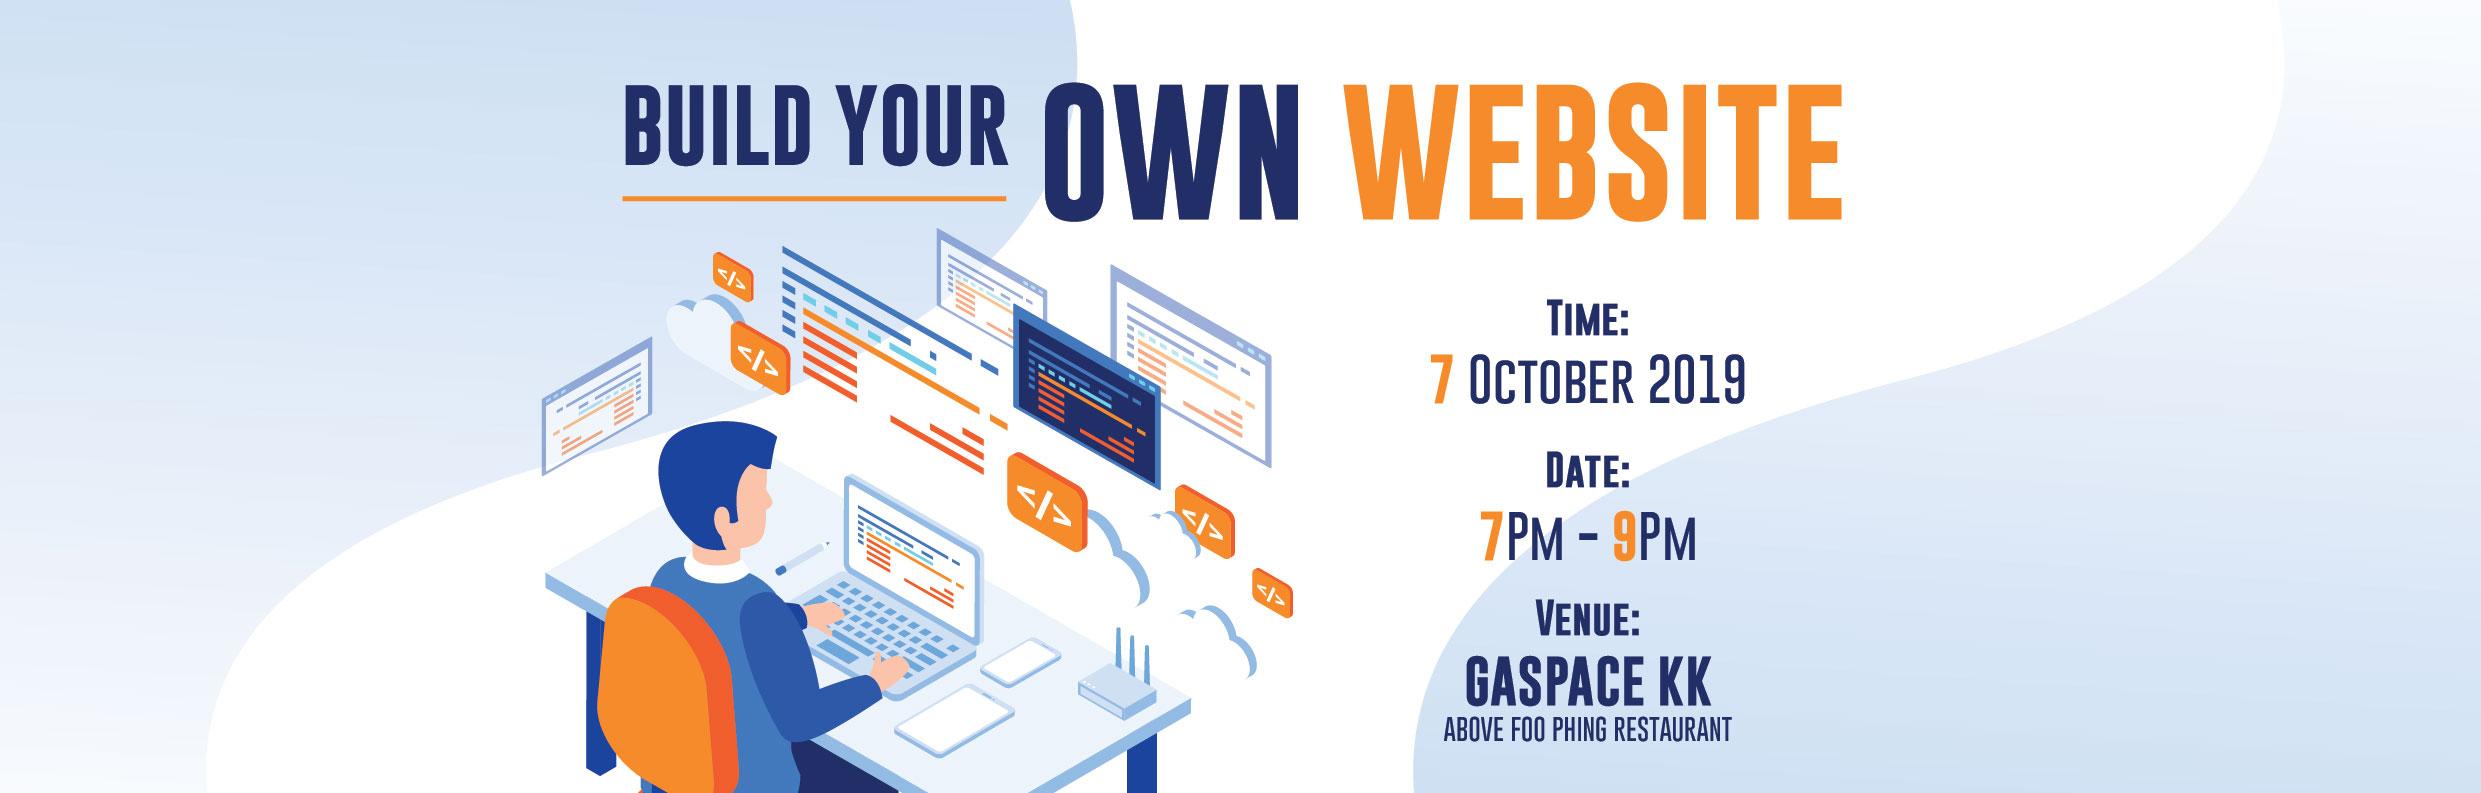 Build Your Own Website